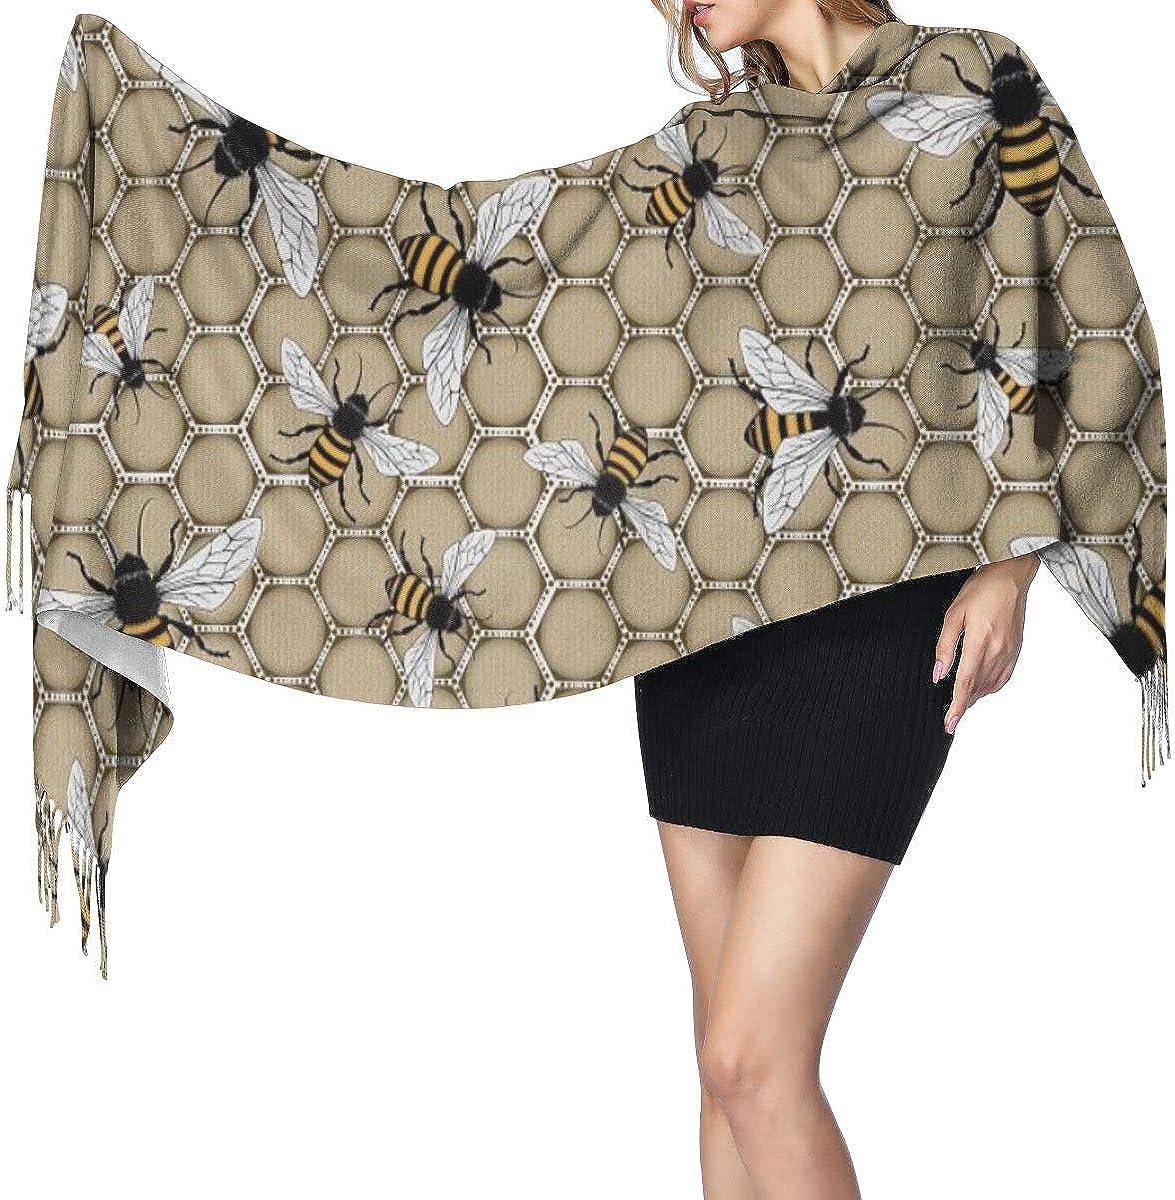 Summer Honeybee Women's Winter Warm Scarf Fashion Long Large Soft Cashmere Shawl Wrap Scarves